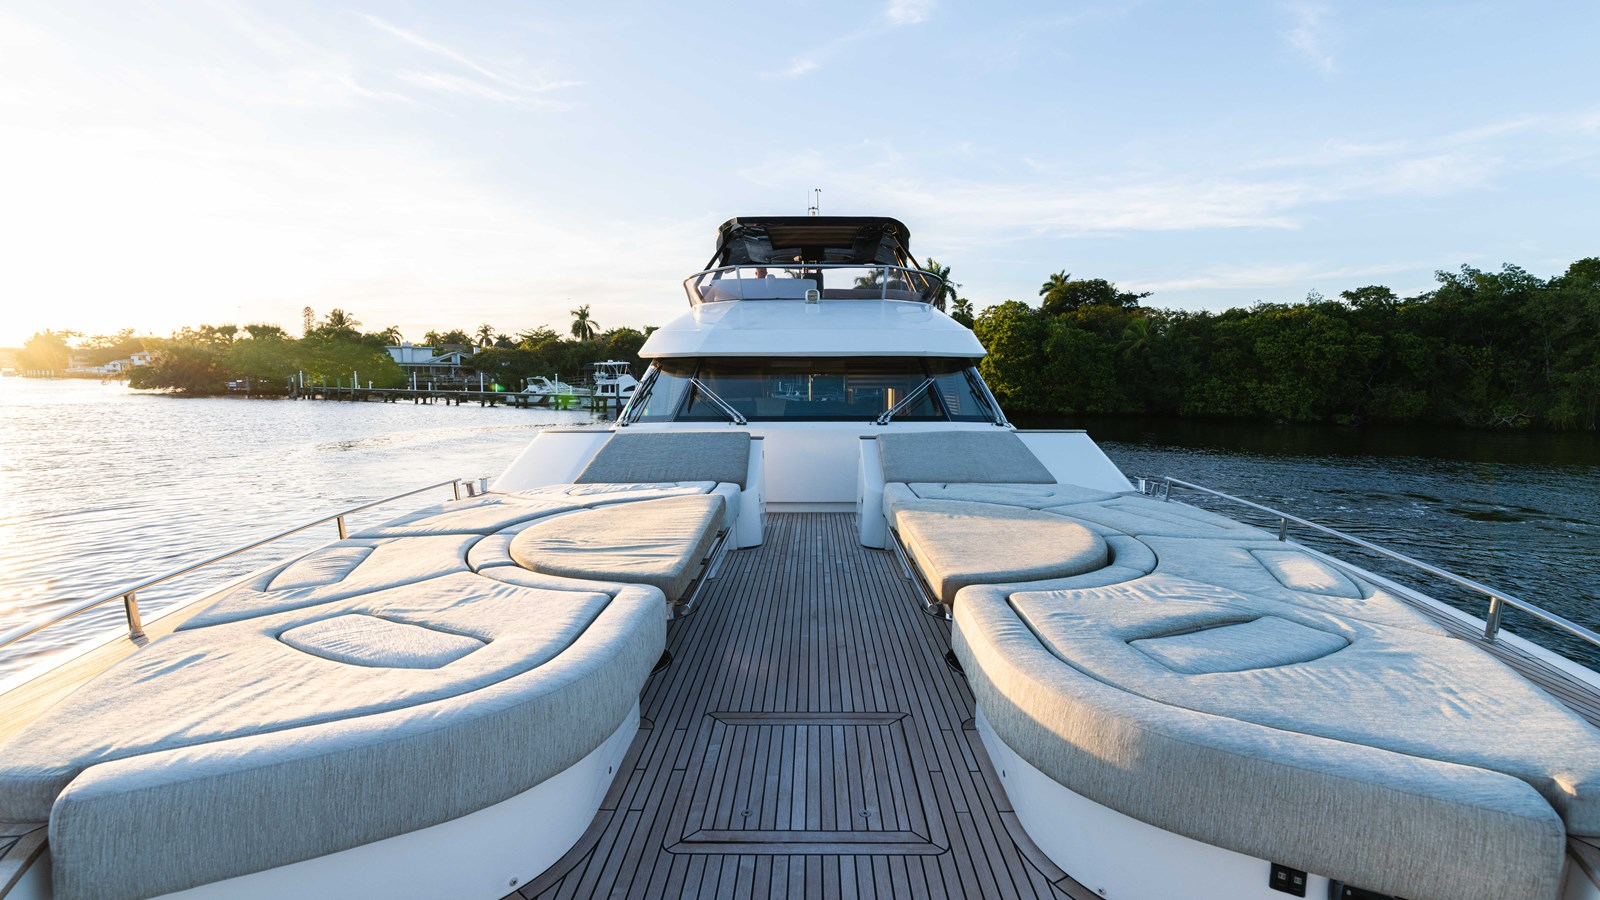 76 Monte Carlo (70 of 127) 2014 MONTE CARLO YACHTS Motoryacht Motor Yacht 2825079